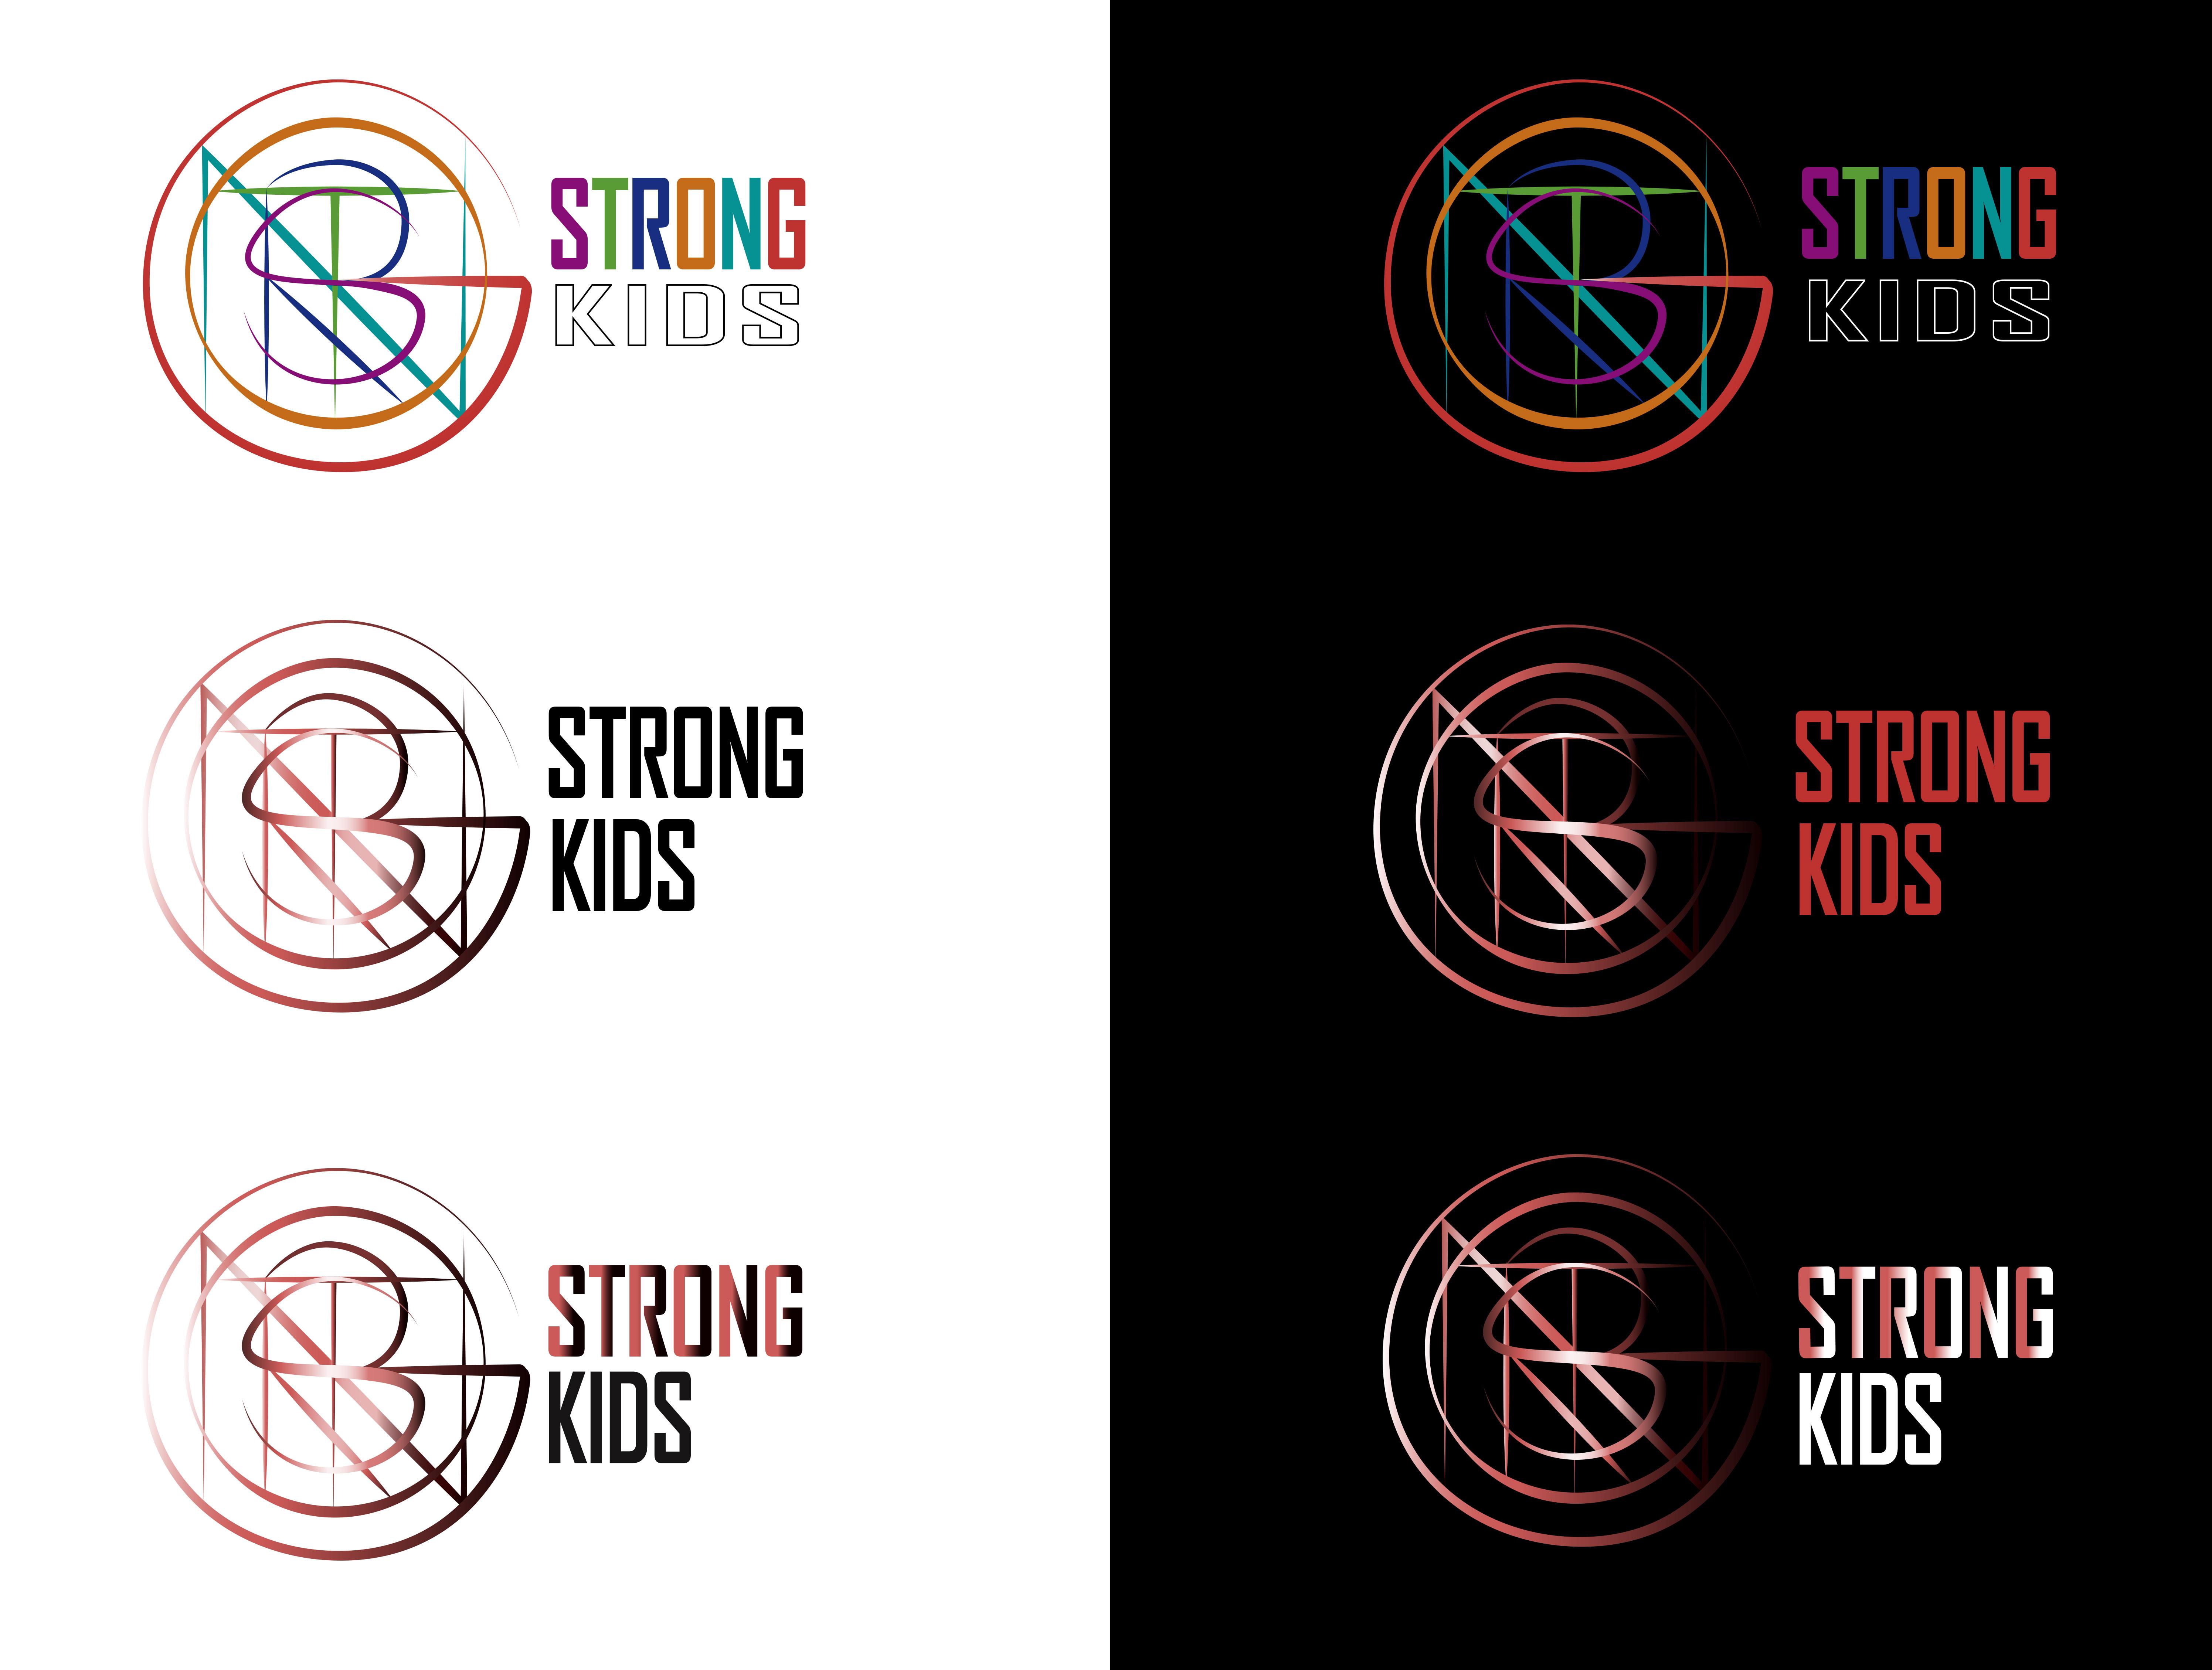 Логотип для Детского Интернет Магазина StrongKids фото f_4595c76b92d5abe3.jpg